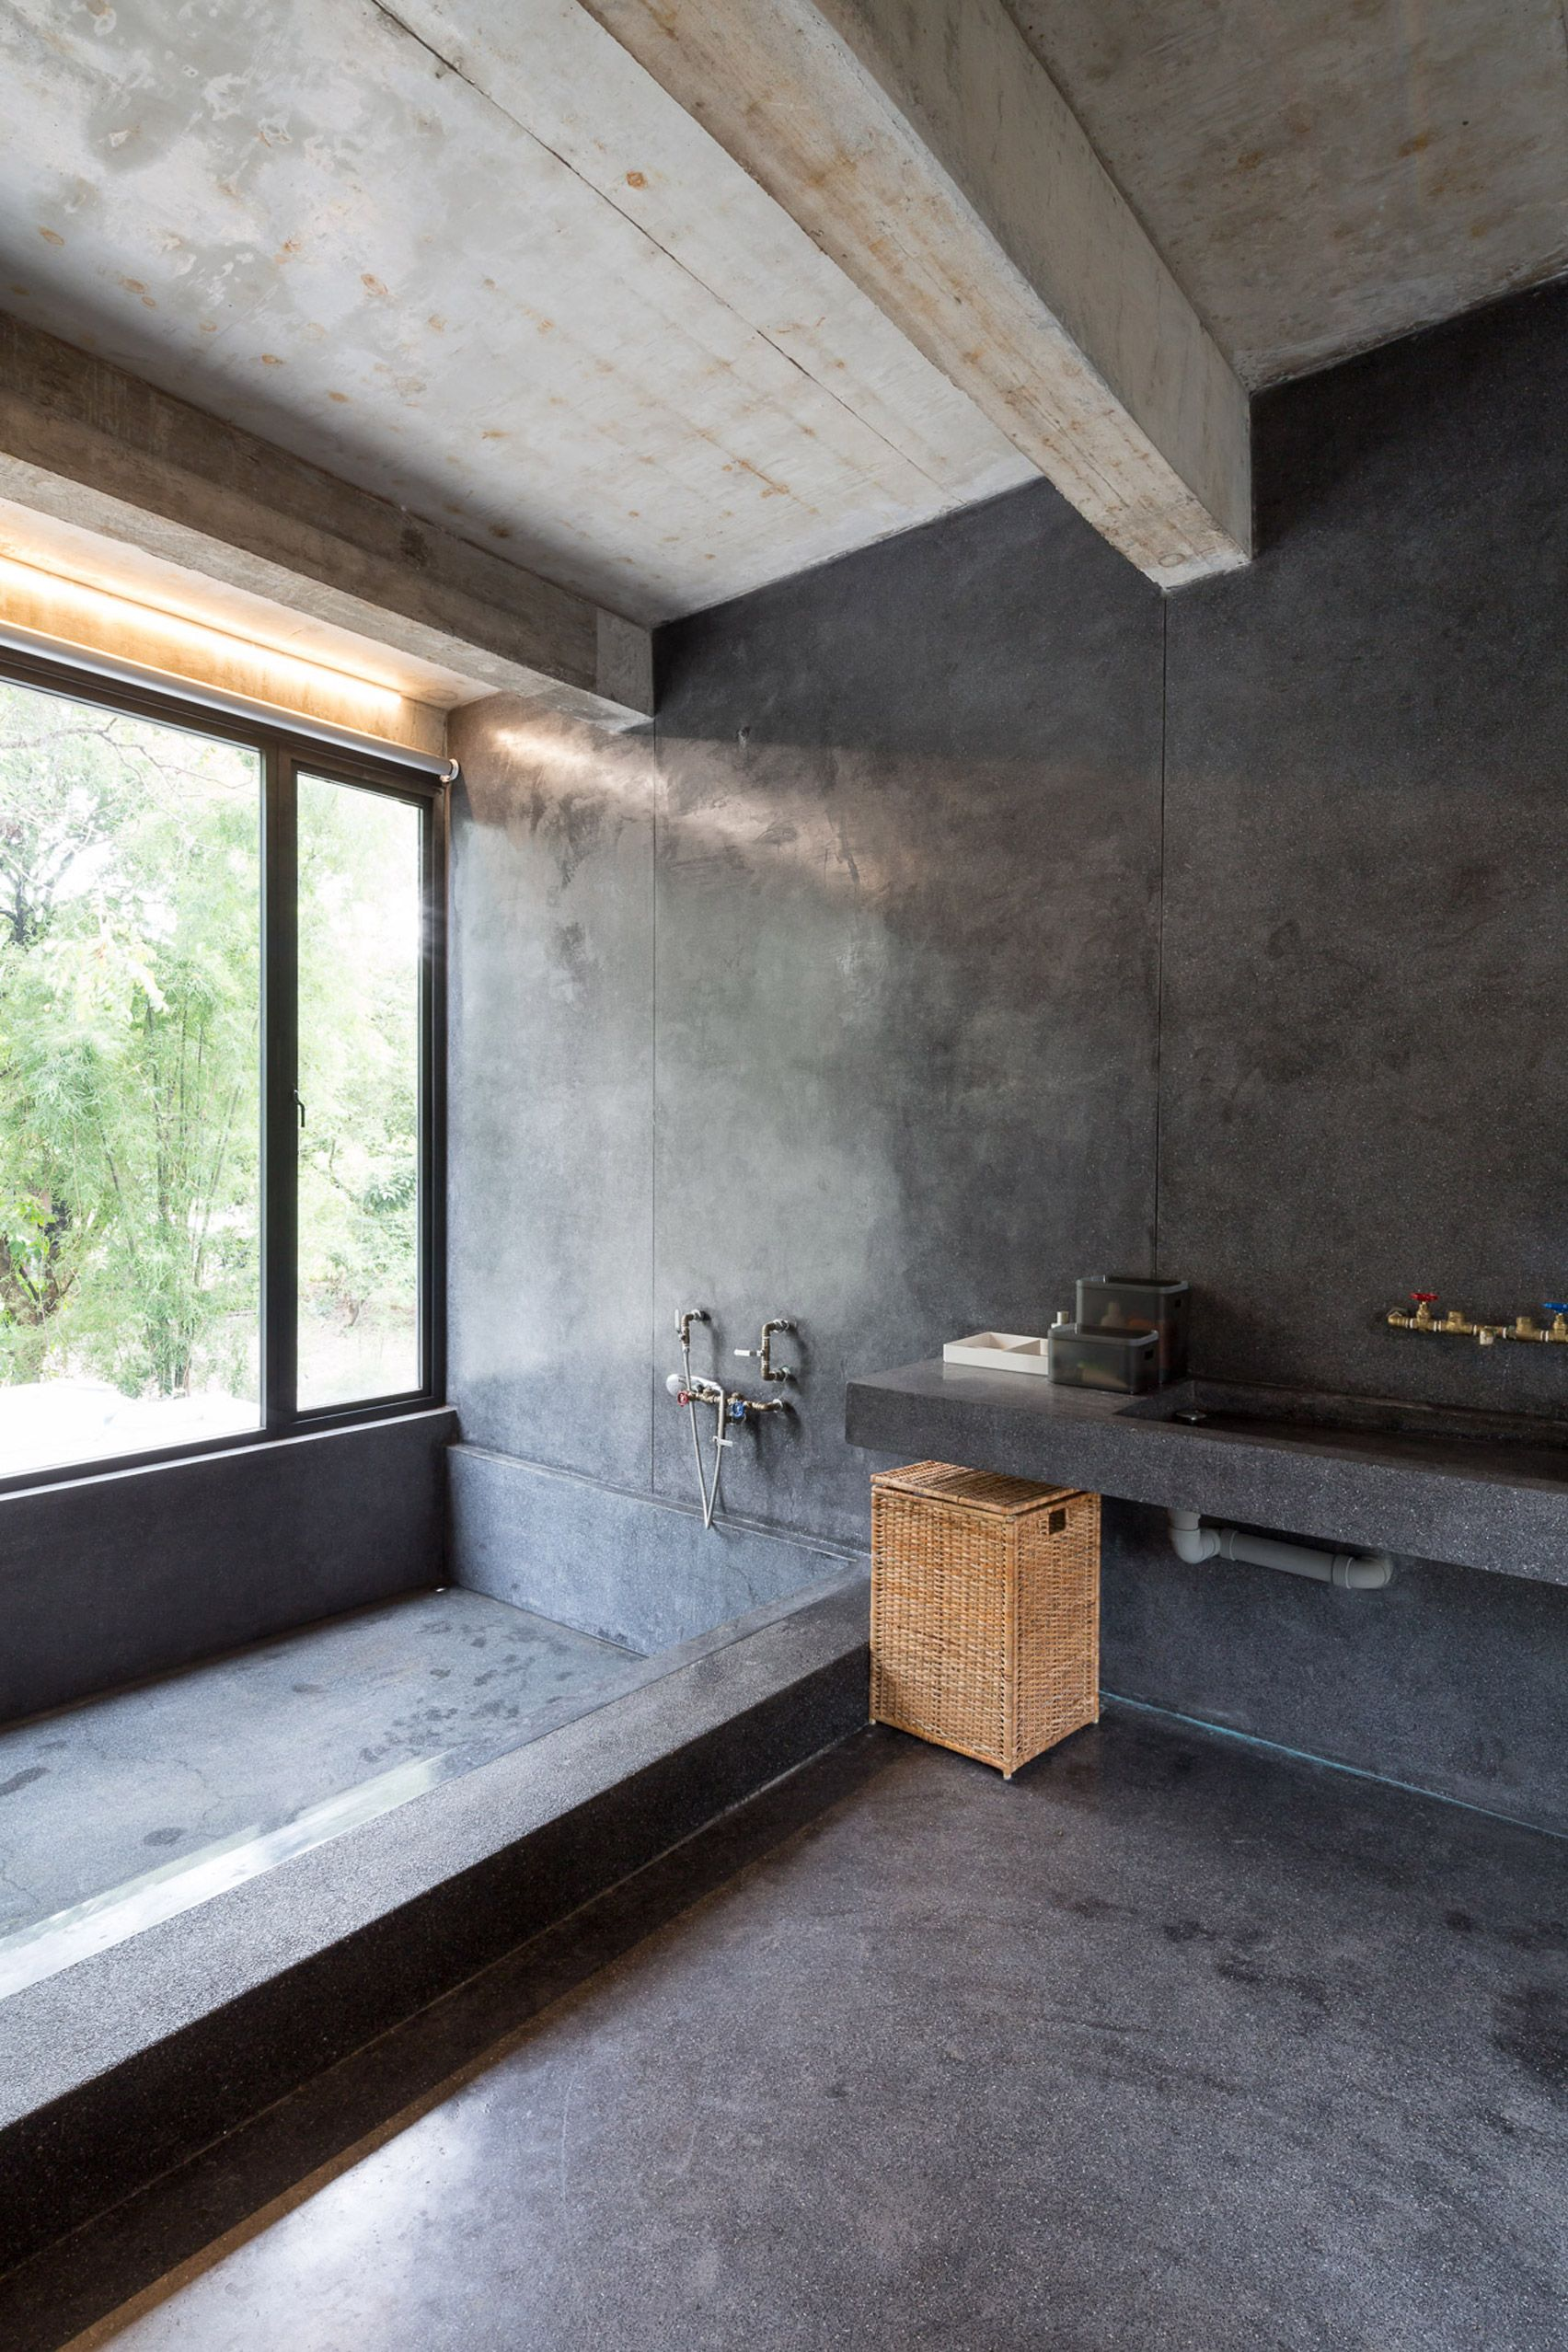 Photo filippo poli sweet home make interior decoration design ideas also rh pinterest